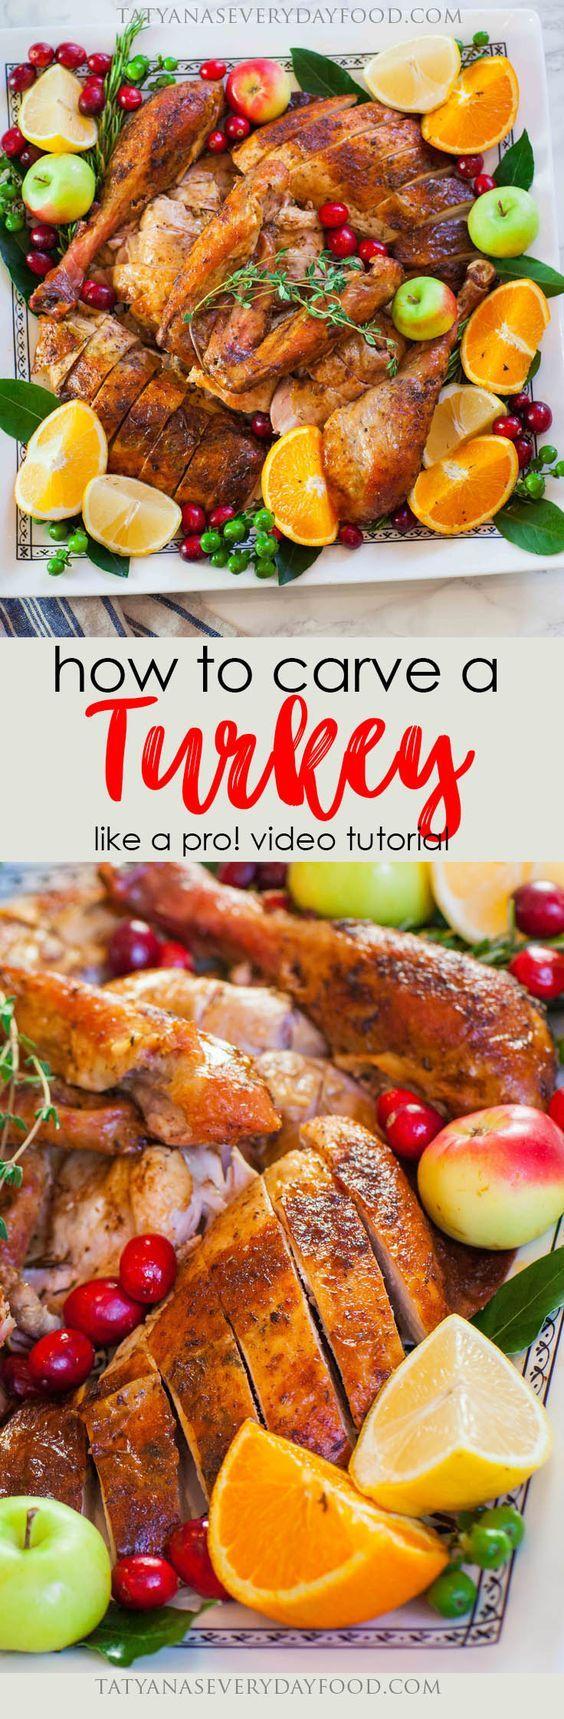 How To Carve A Turkey Like a Pro! - Tatyanas Everyday Food